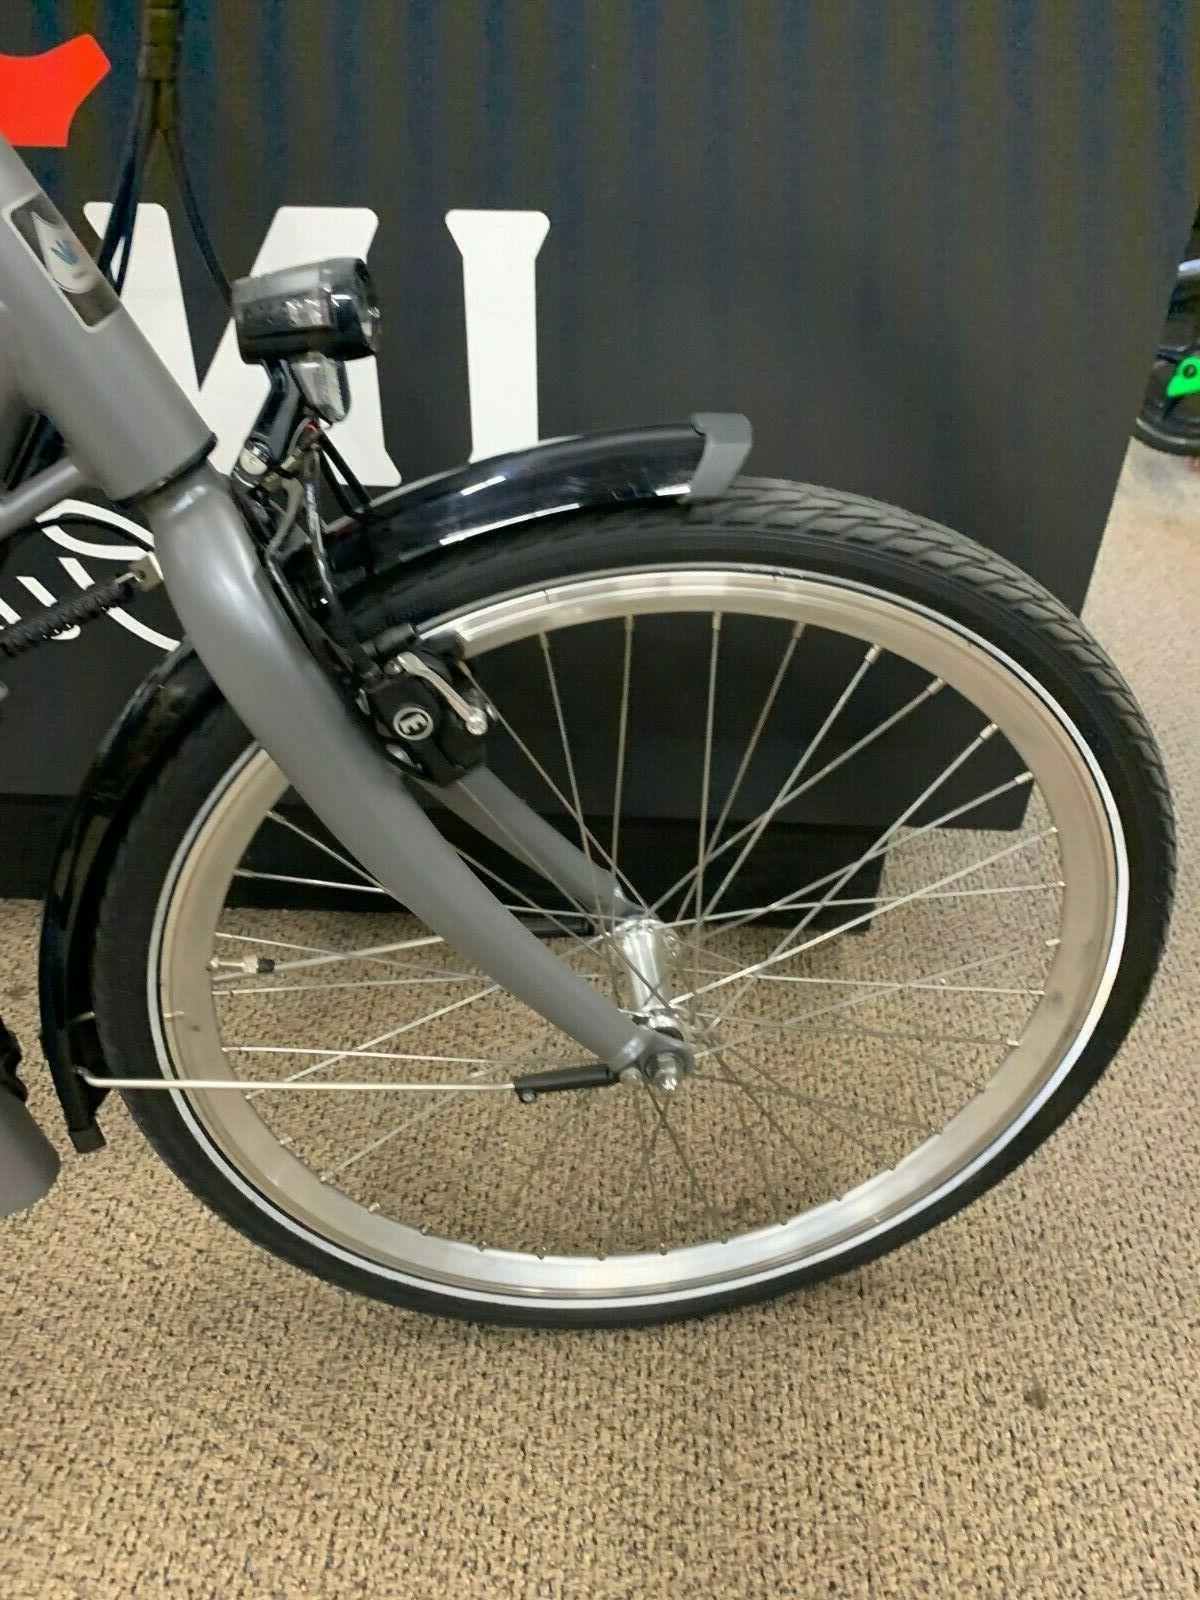 P-Tec C2 Bike, Wheels, Bafang